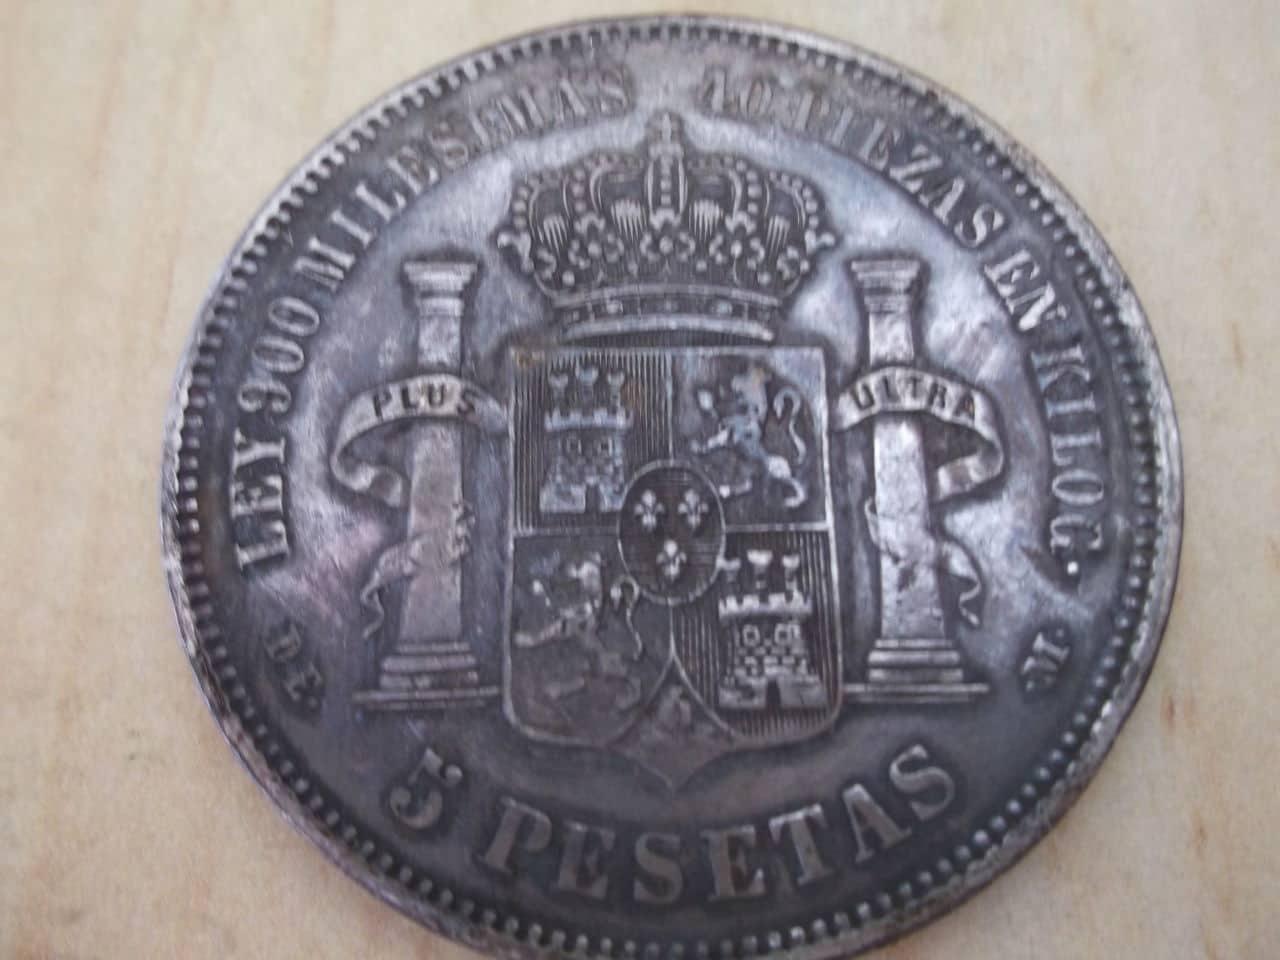 5 pesetas de 1875 DEM DSCF3343